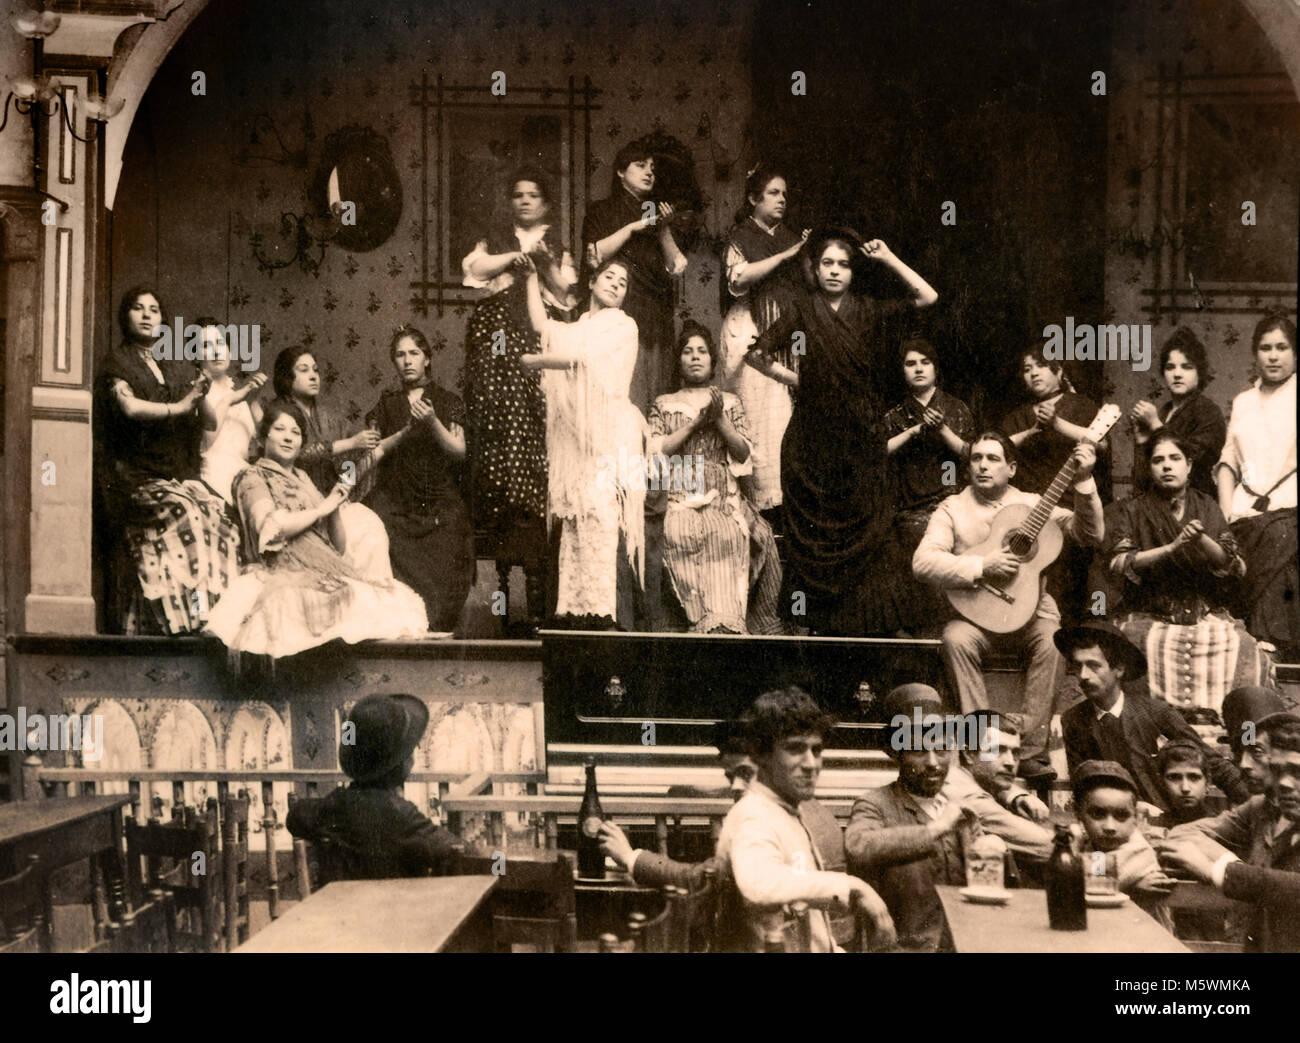 Antonio Fernández Díaz was born in Puente Genil (Córdoba) on August 3, 1932 ( Cordoba Flamenco museum - Stock Image